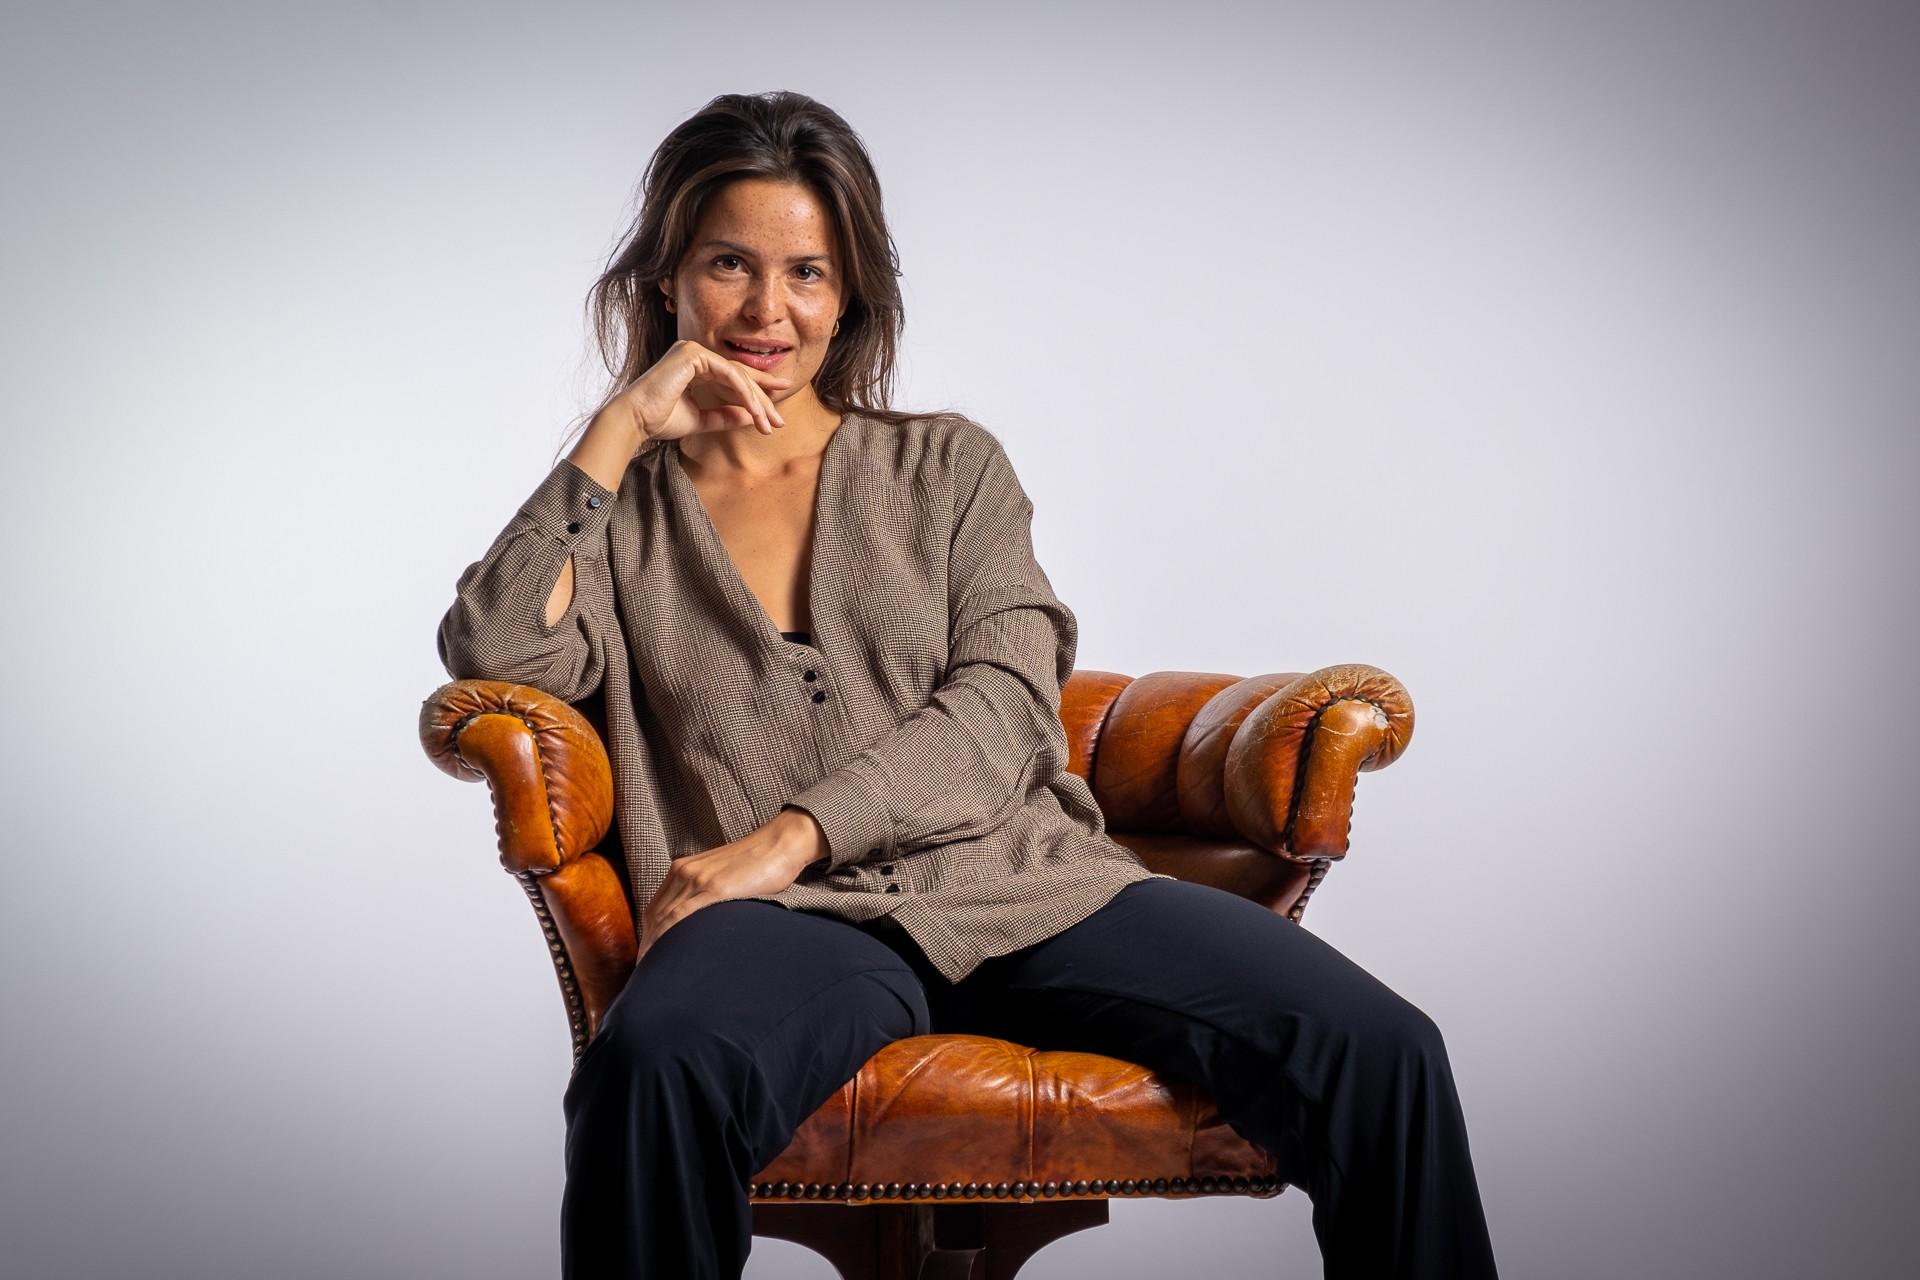 Laura van Ree (30)